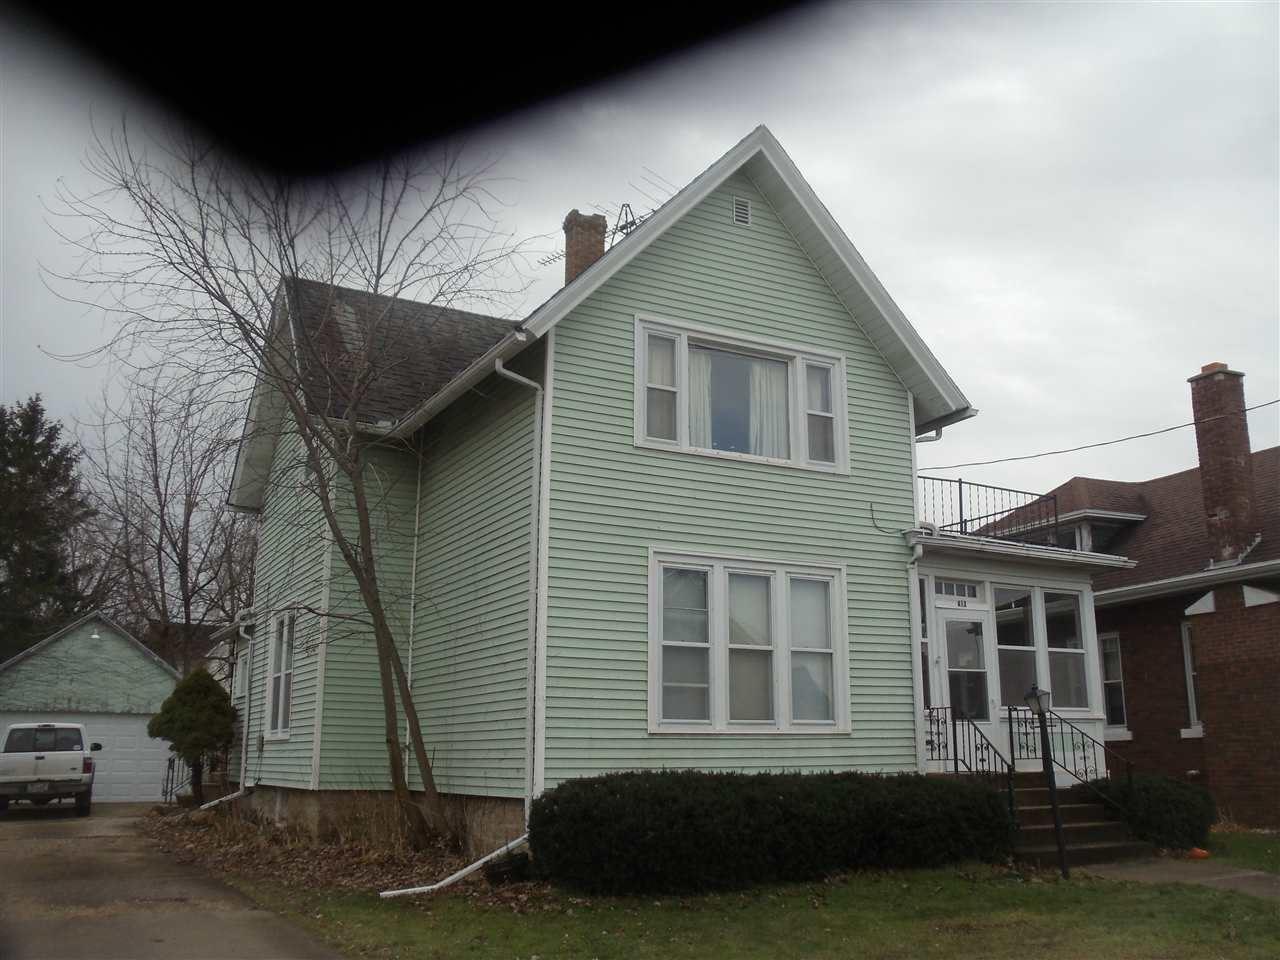 413 E Jefferson St, Waupun, WI 53963 - #: 1873090